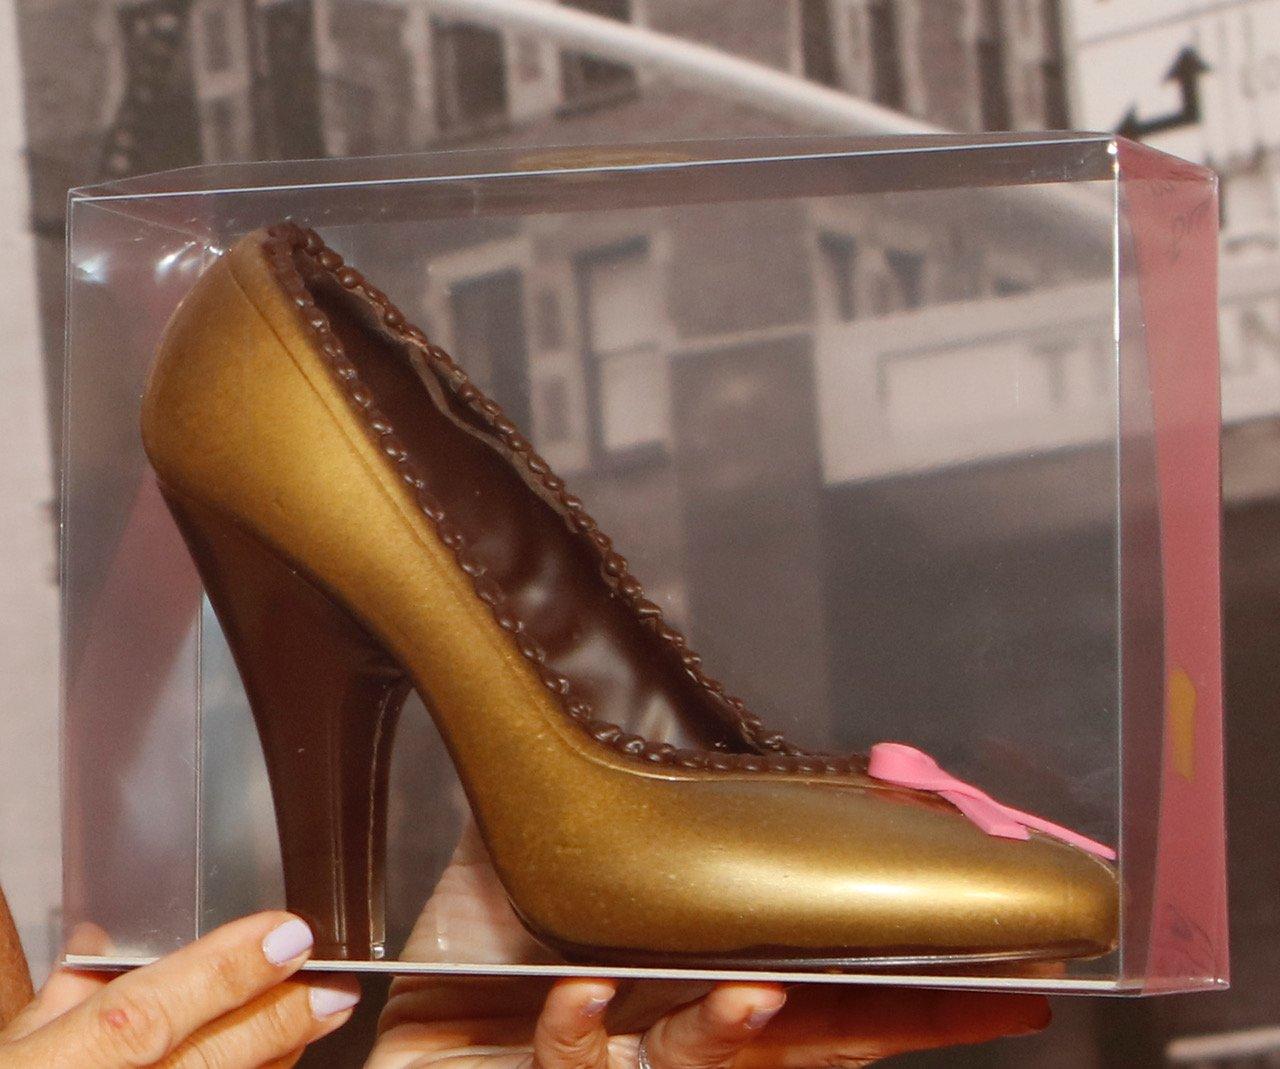 aida-pink-ribbon-schoko-schuh-gold-braun_m5s7702